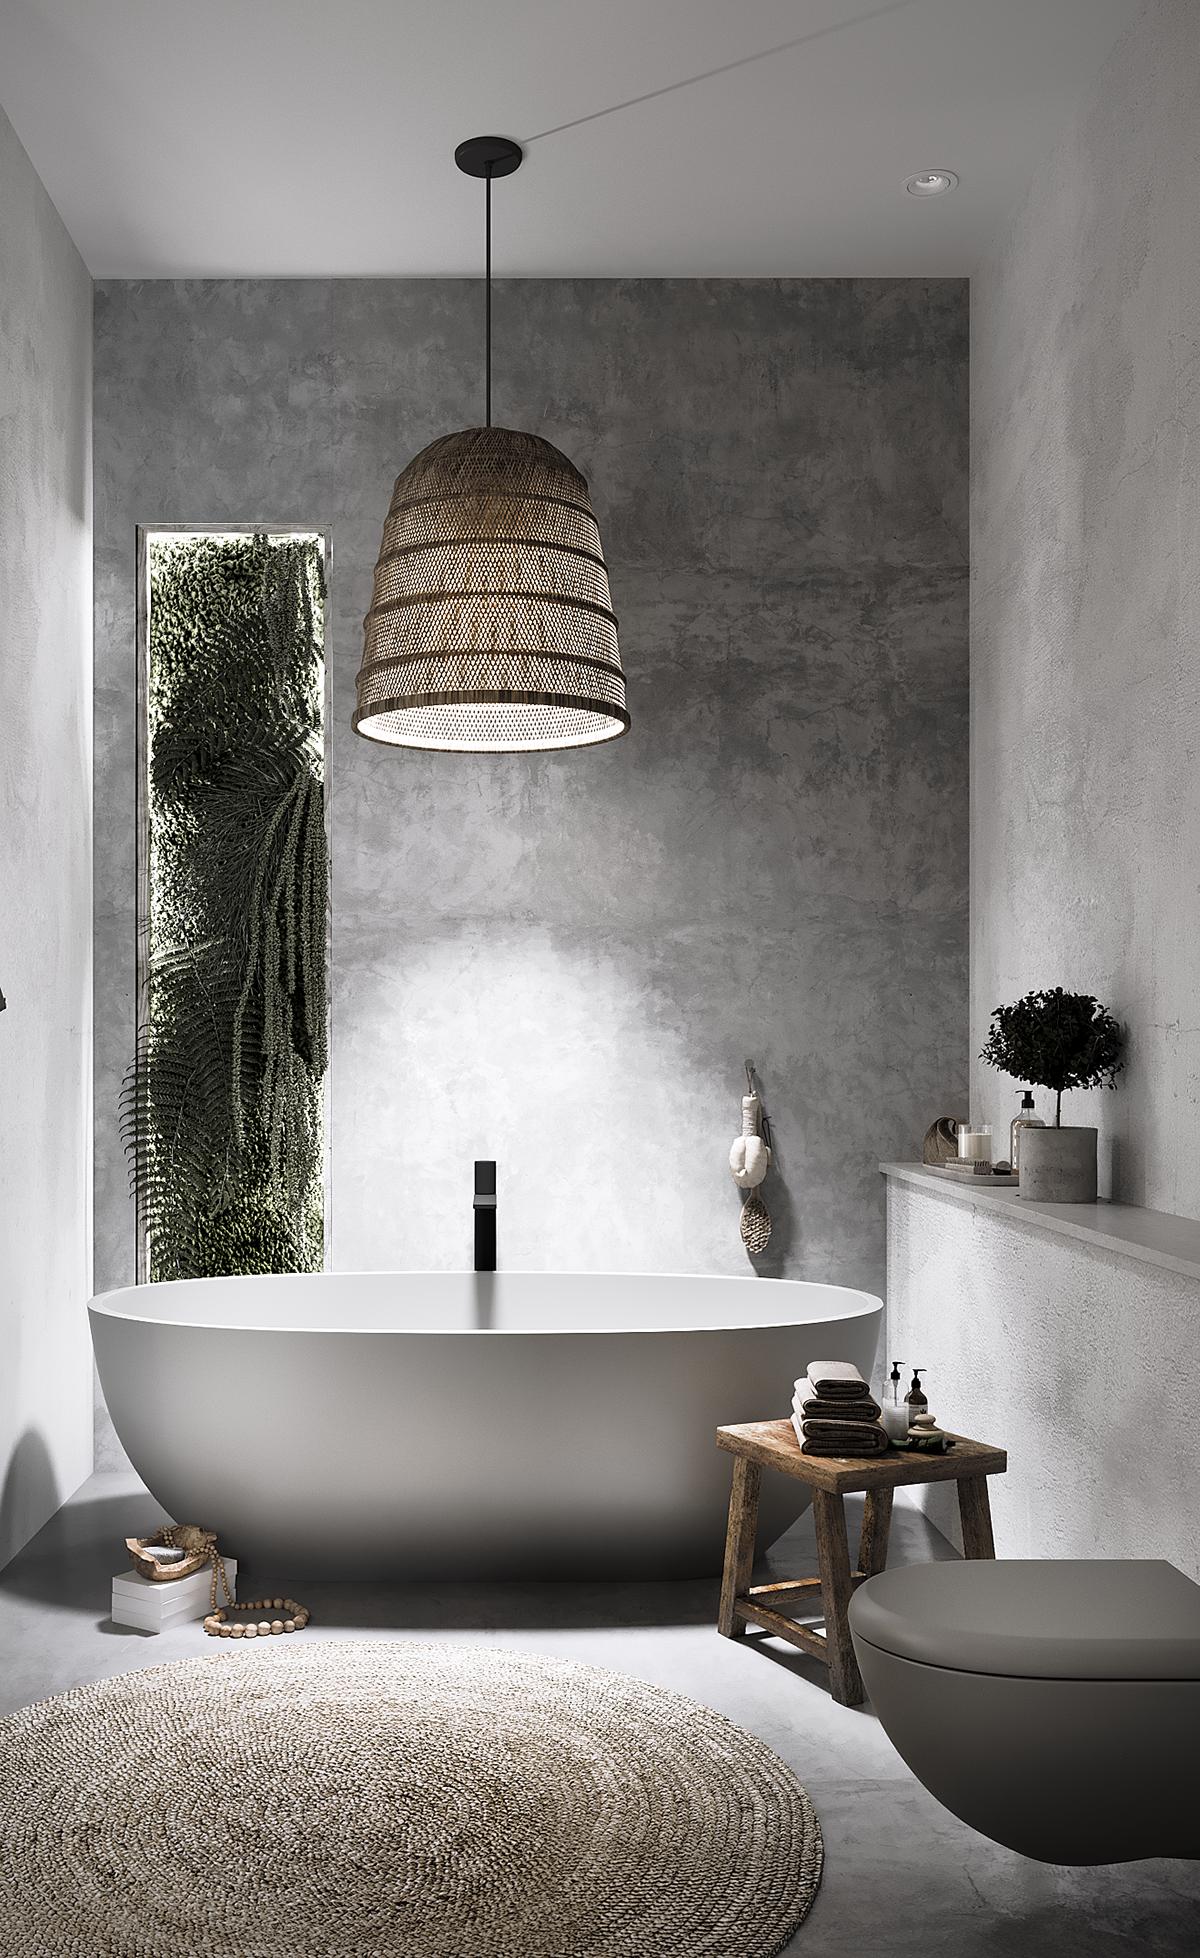 #lvng#bathroom#grey#green#nature#dream#living#design